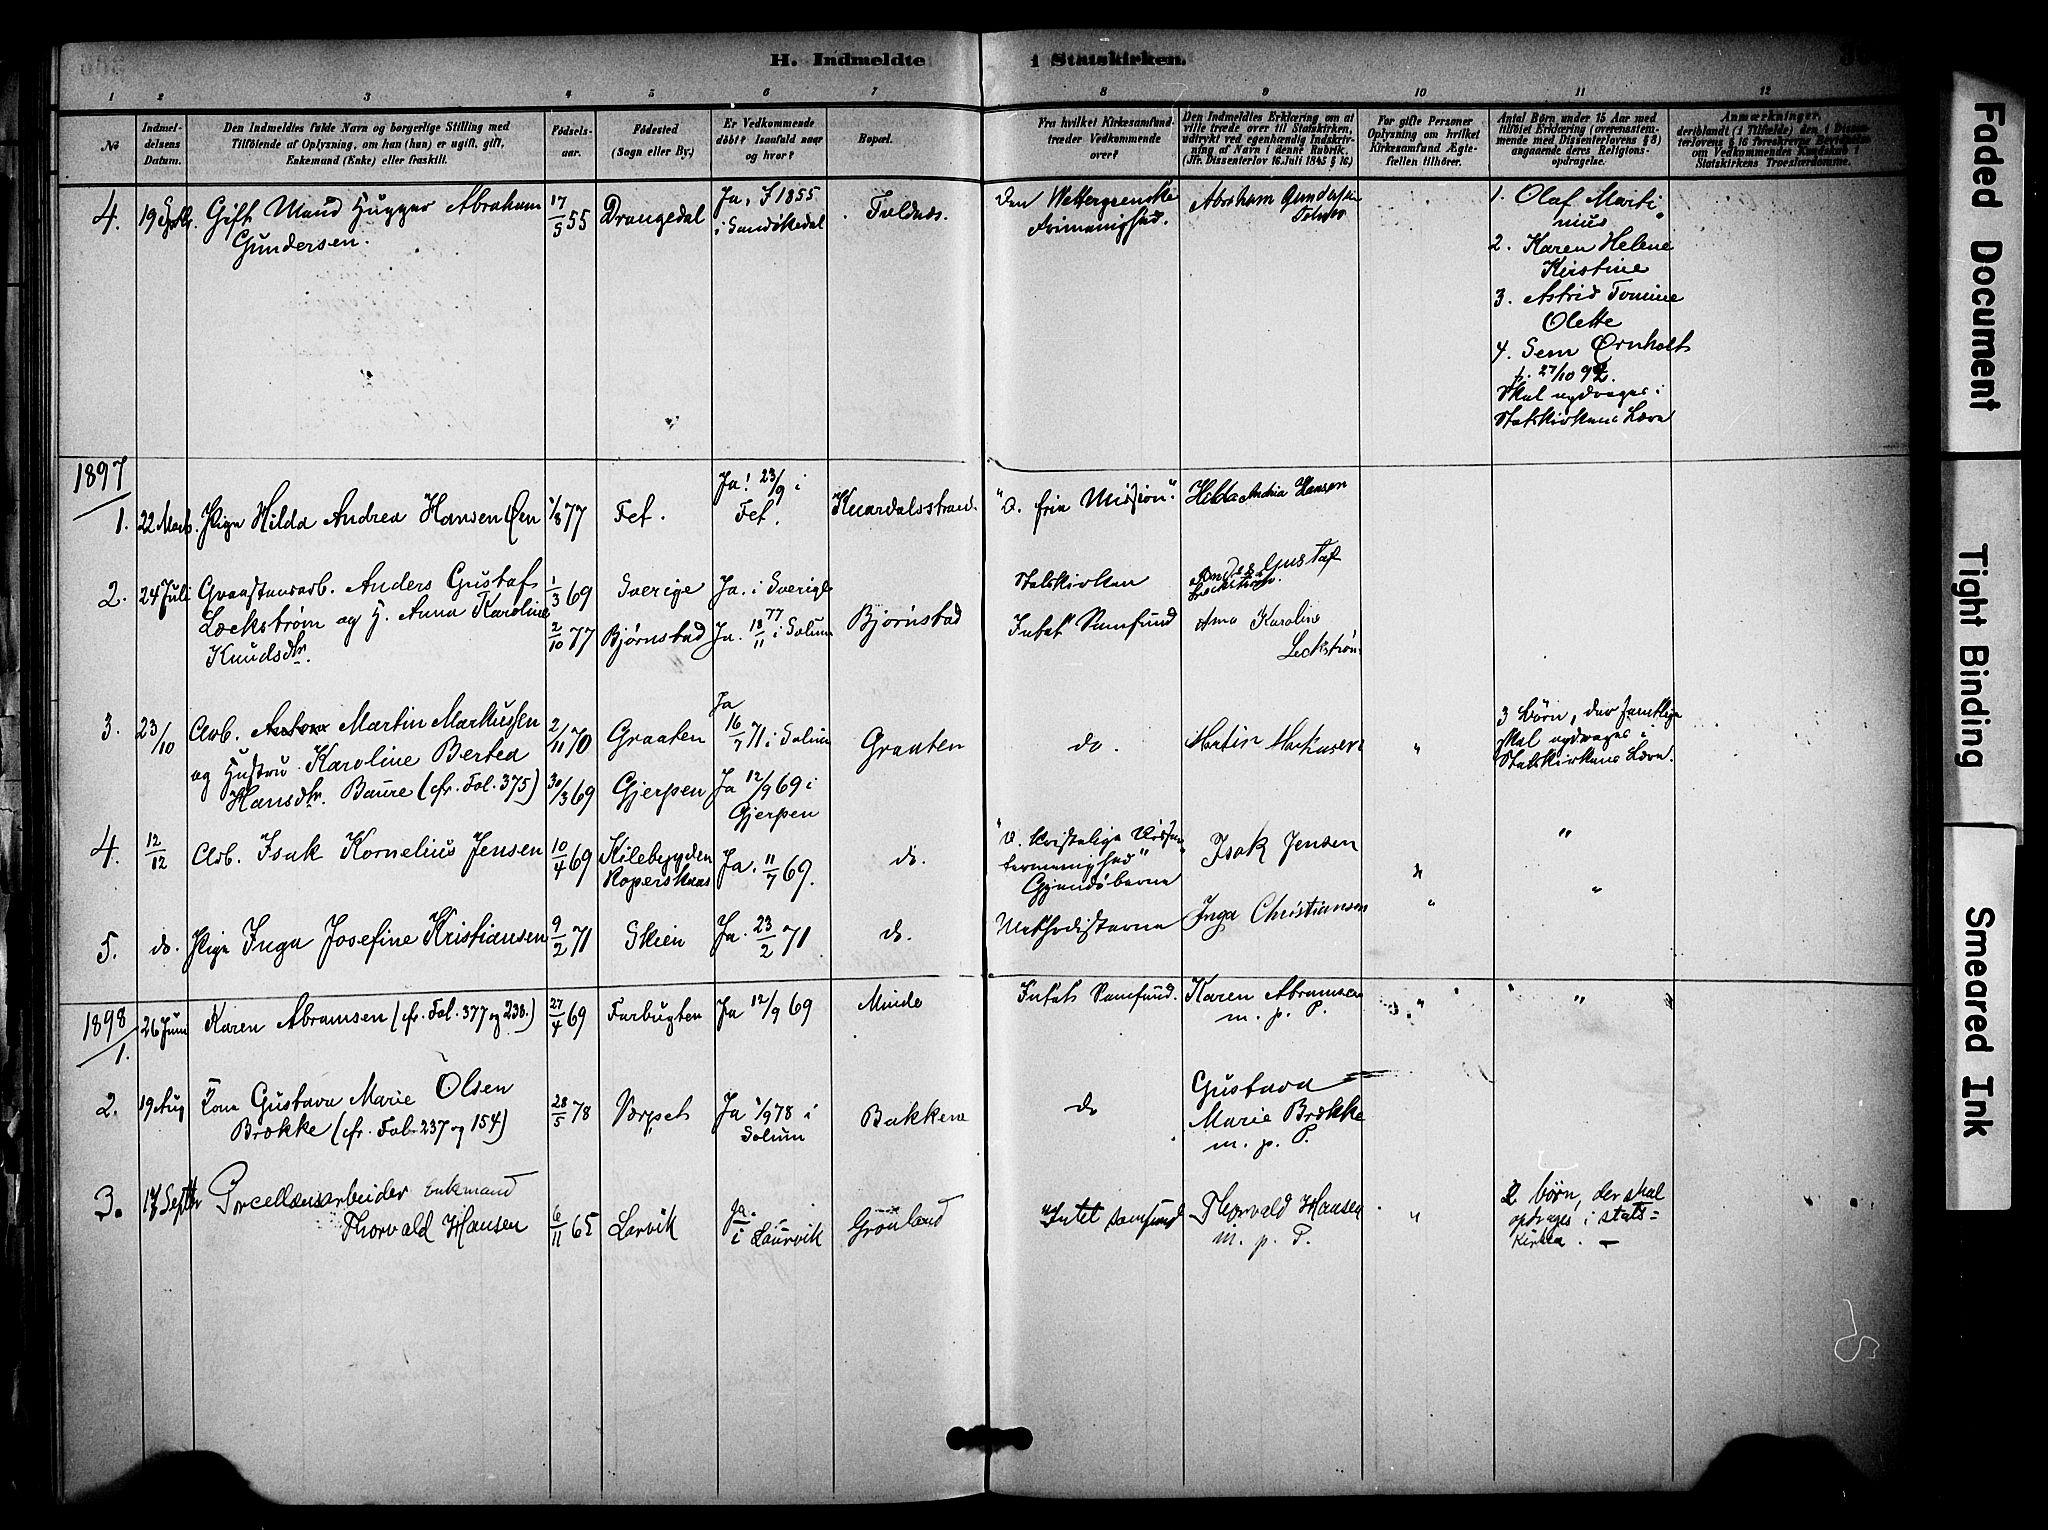 SAKO, Solum kirkebøker, F/Fa/L0010: Ministerialbok nr. I 10, 1888-1898, s. 366